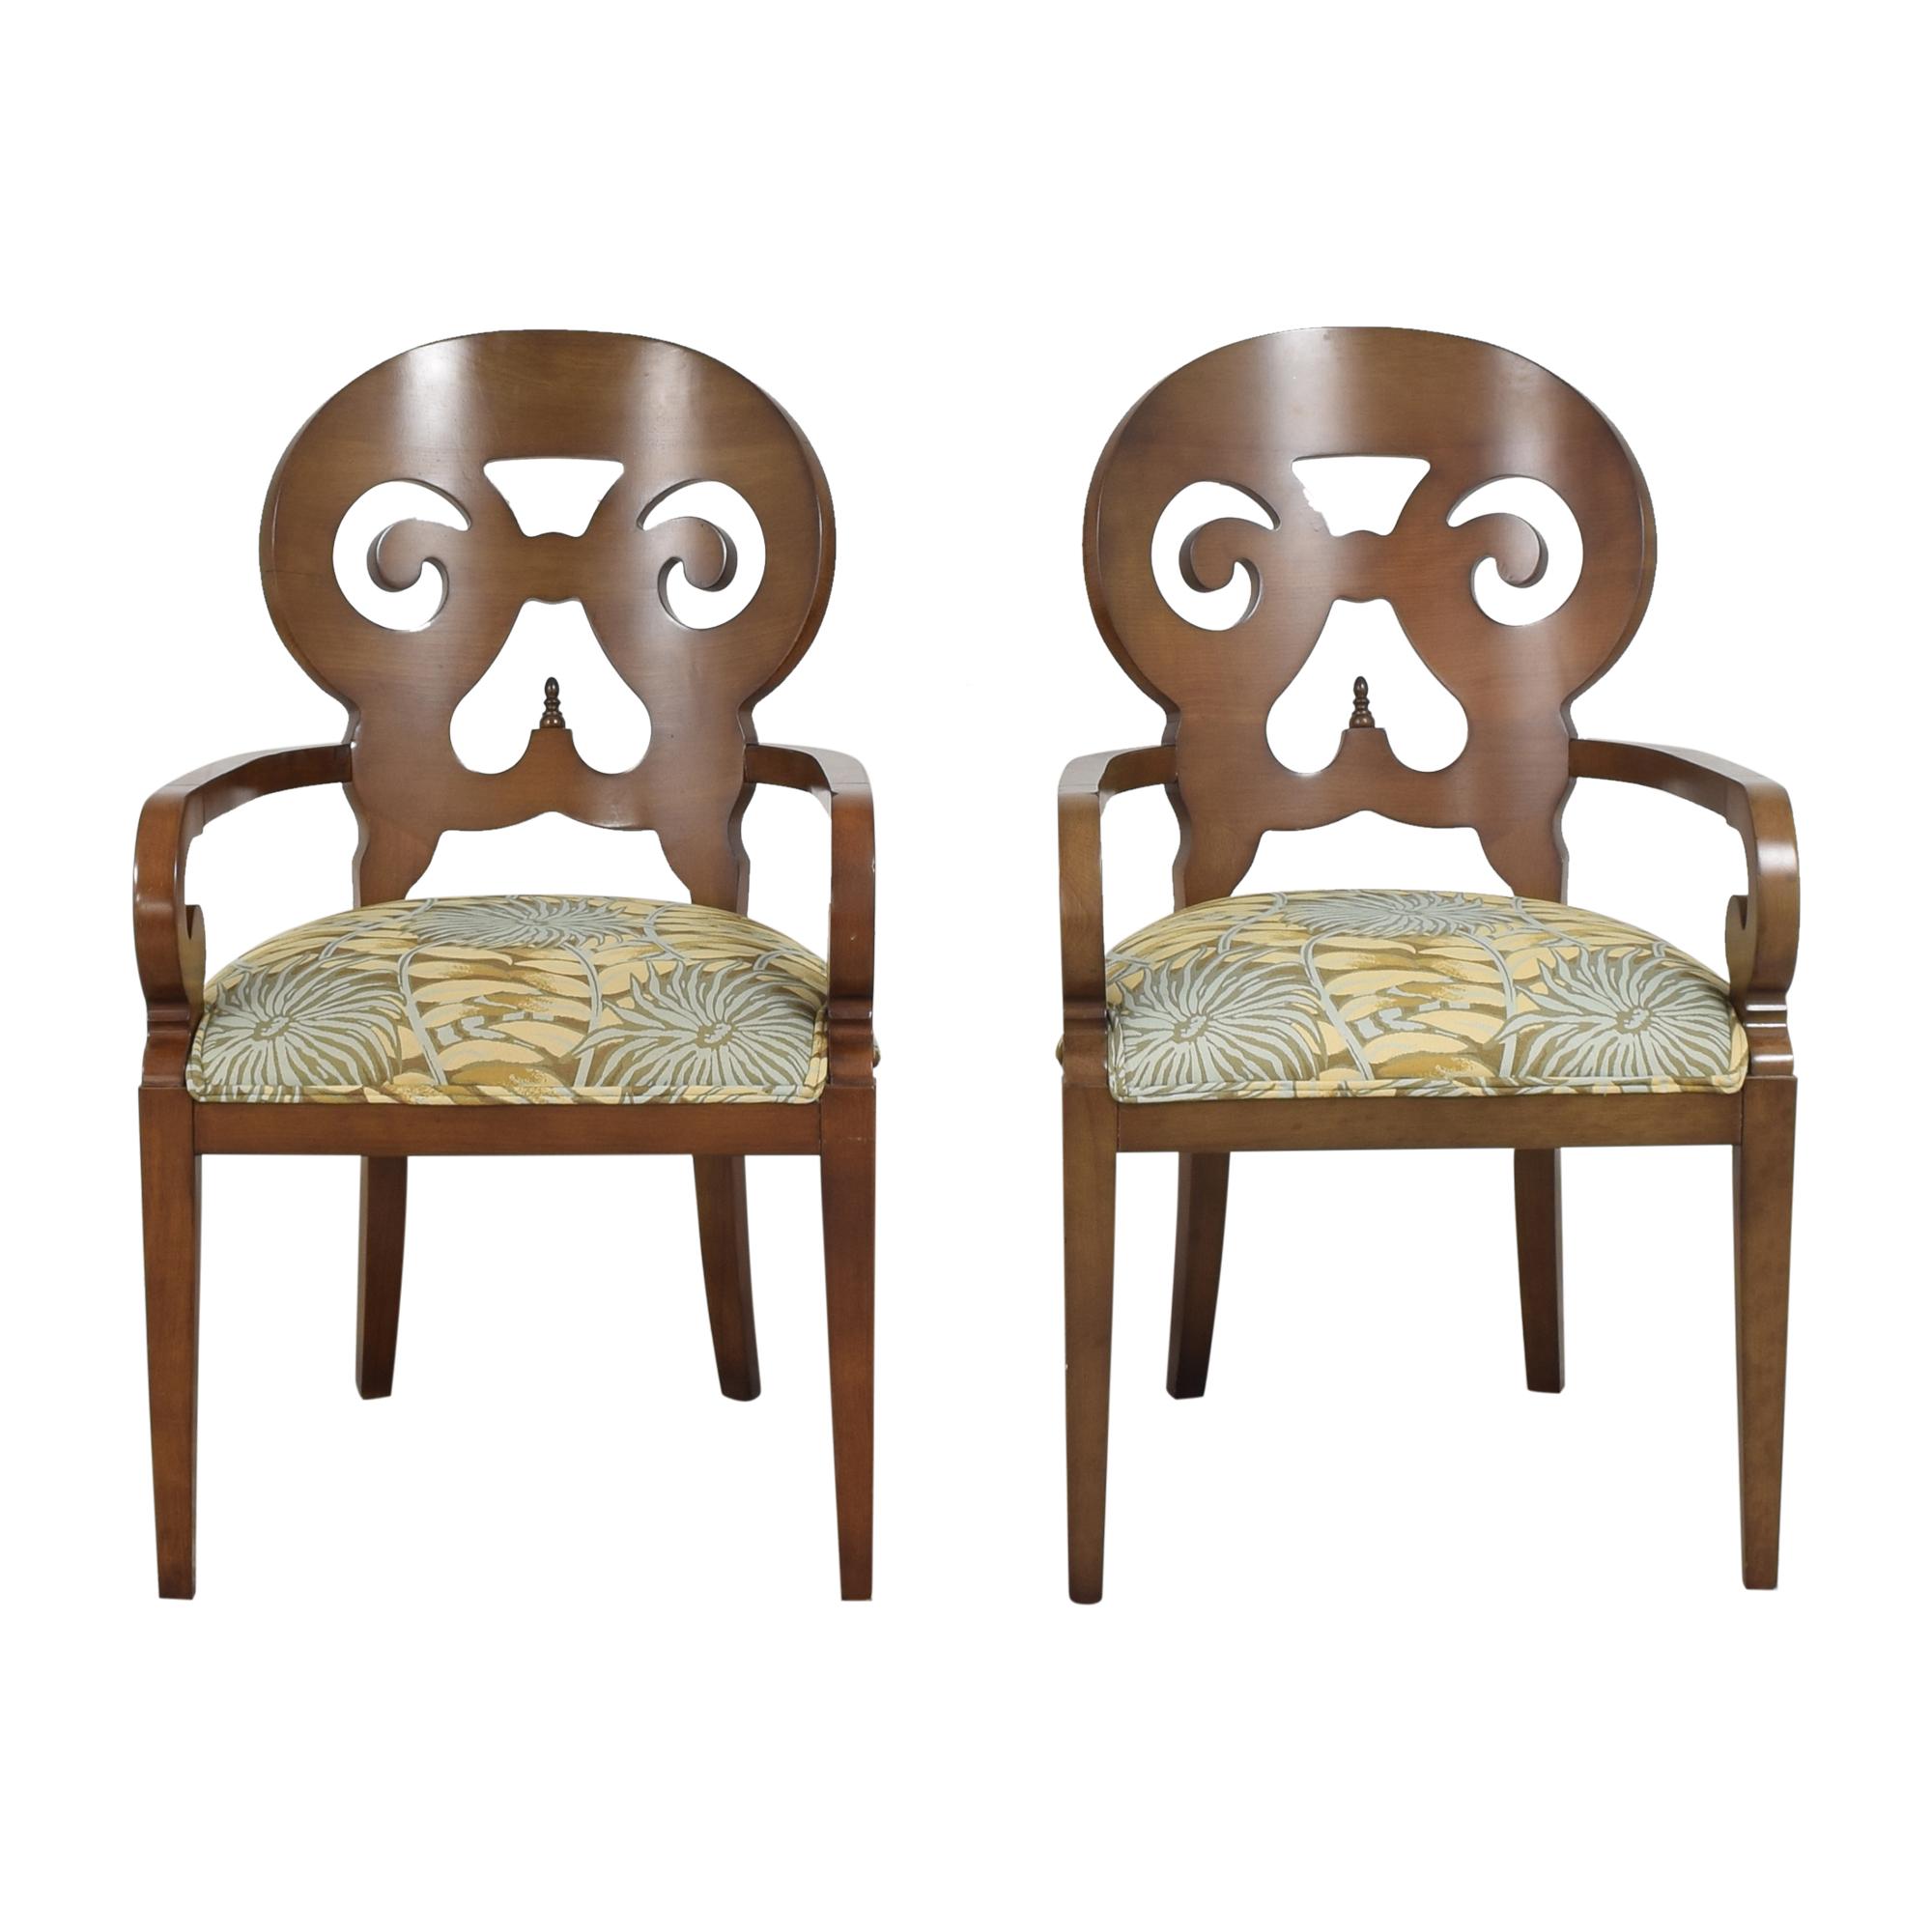 Andre Originals Andre Originals Dining Chairs ma